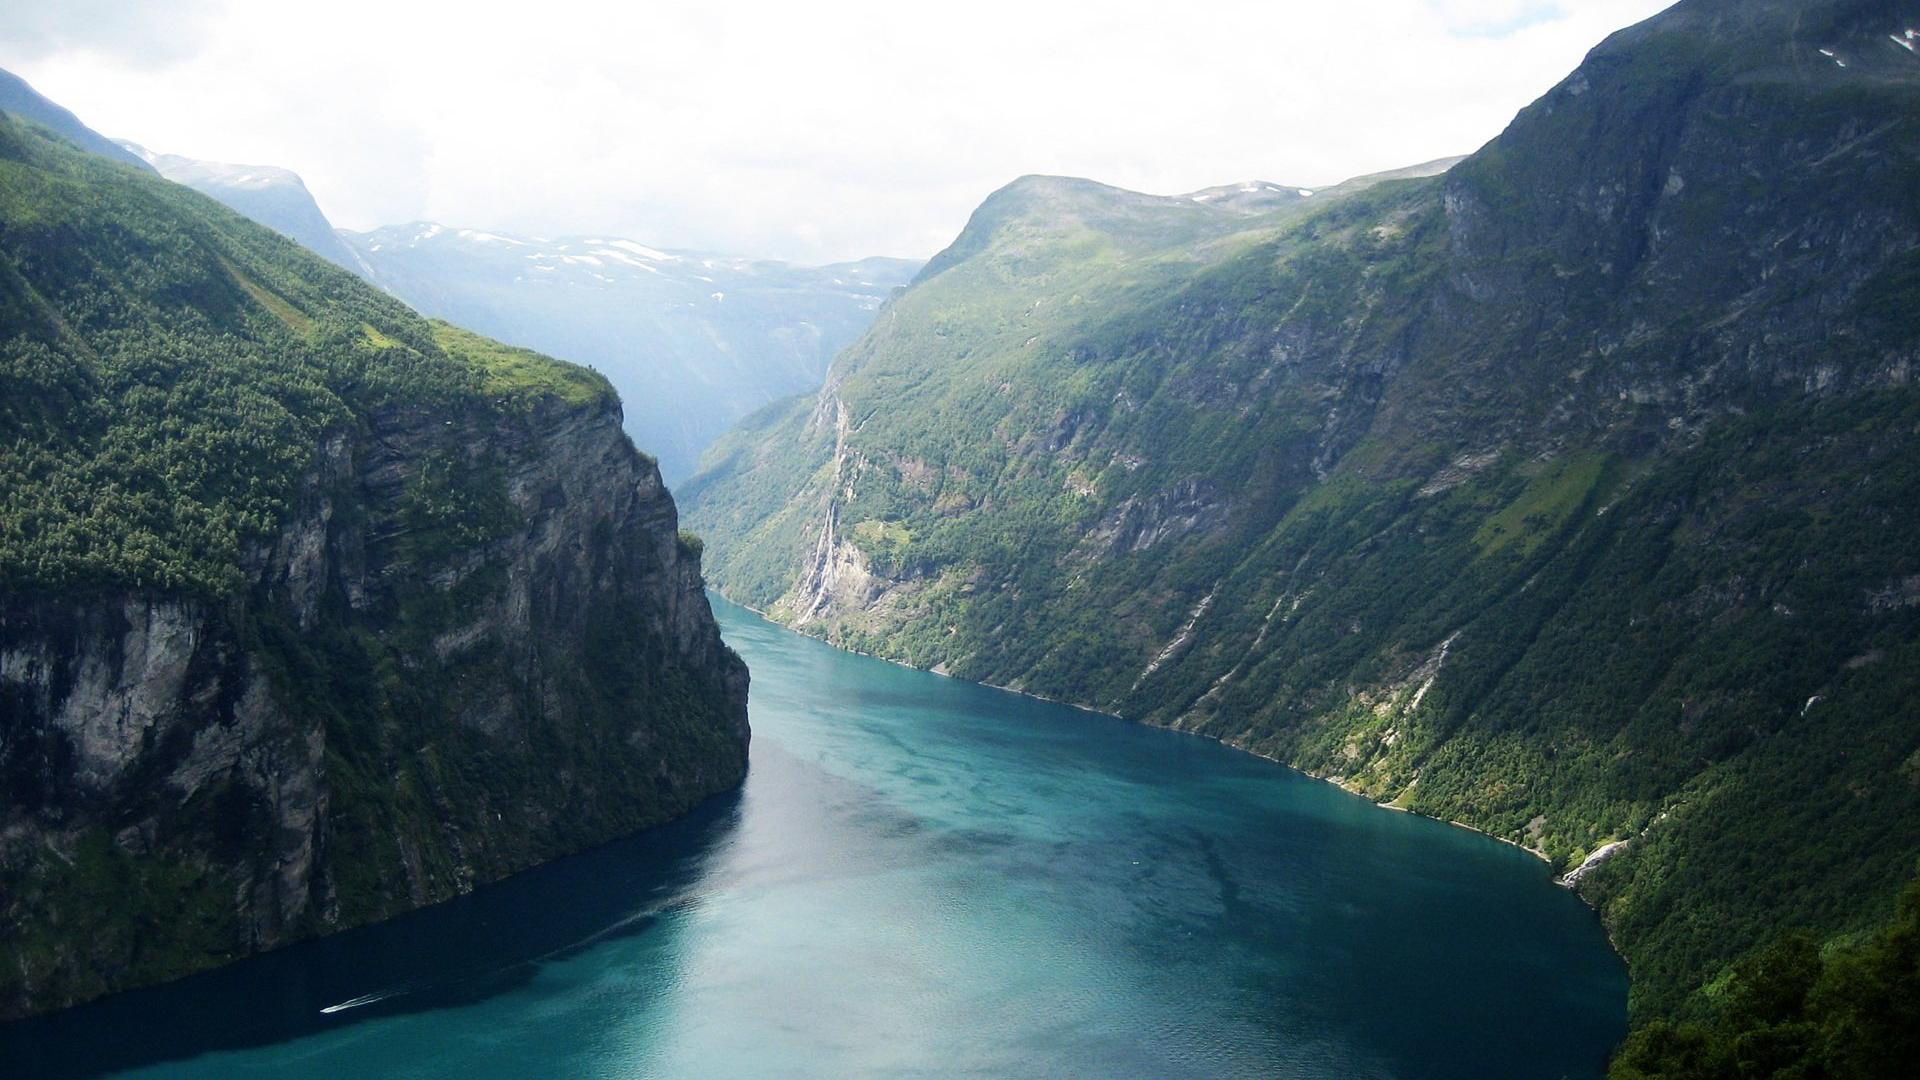 nature amazing river full hd 1080p wallpaper 1920x1080